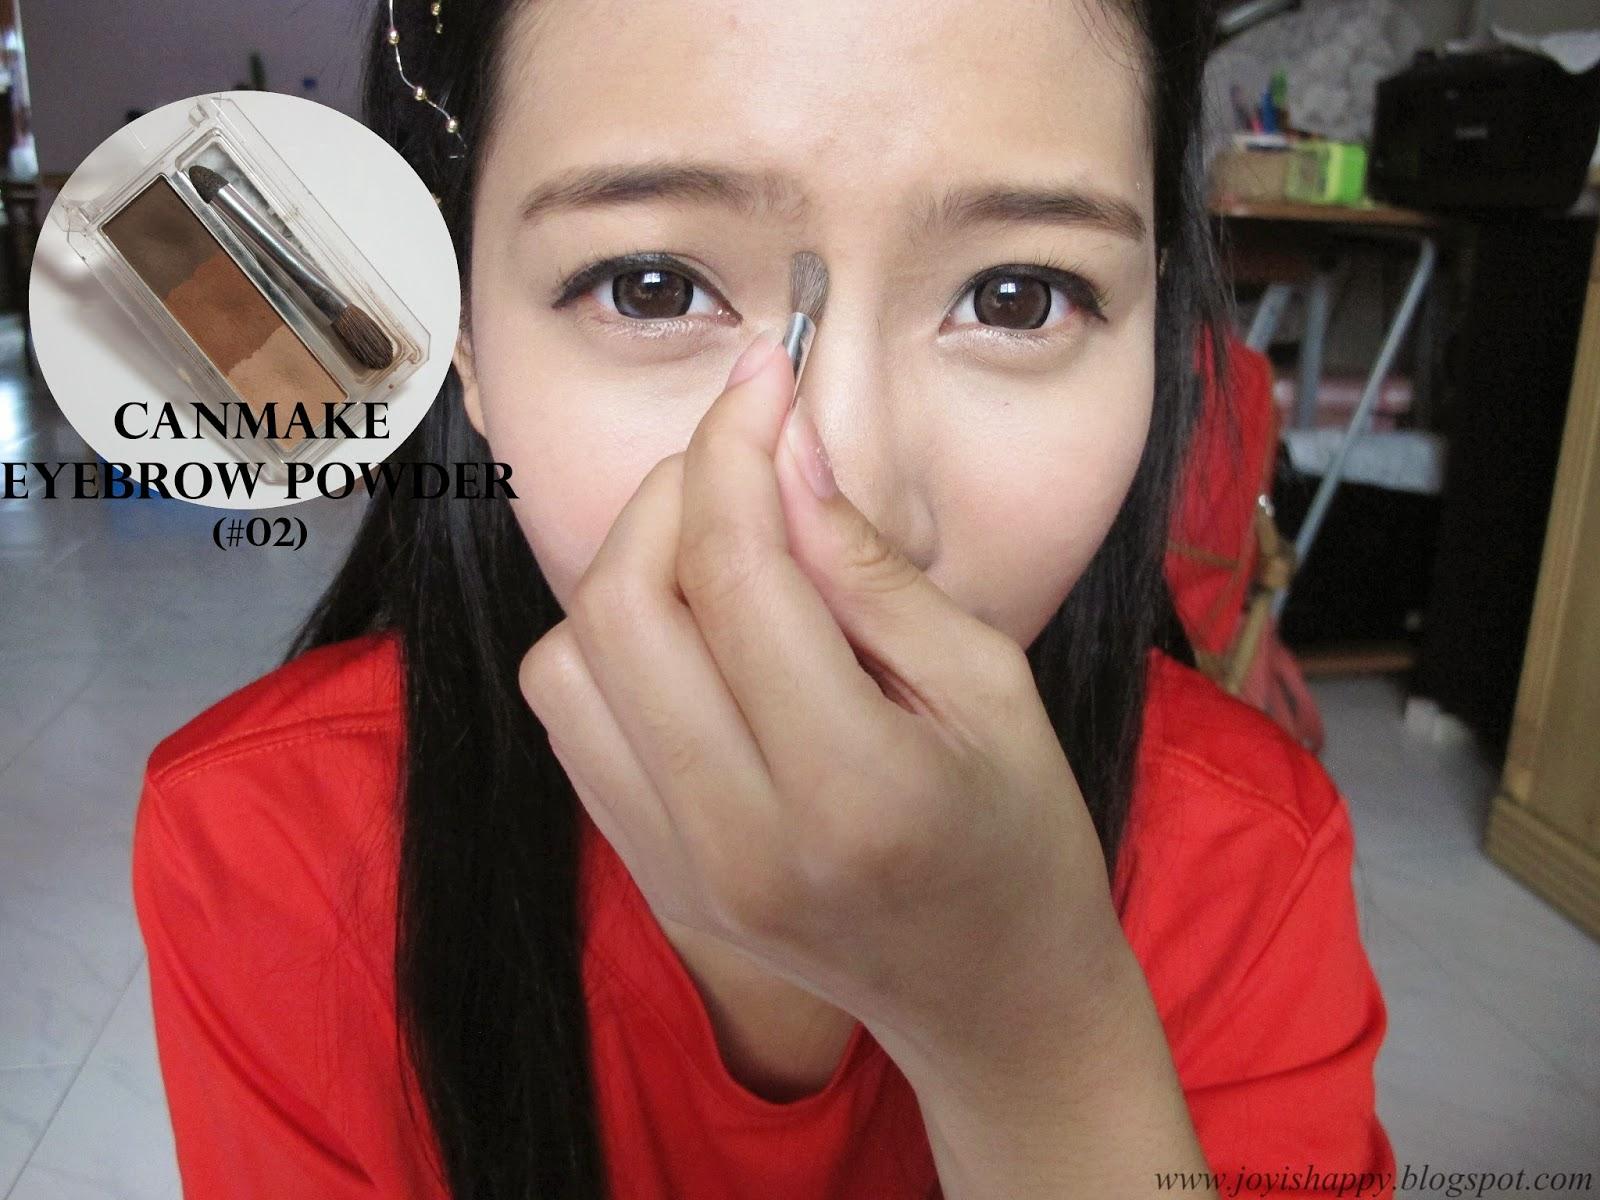 canmake eyebrow powder #02